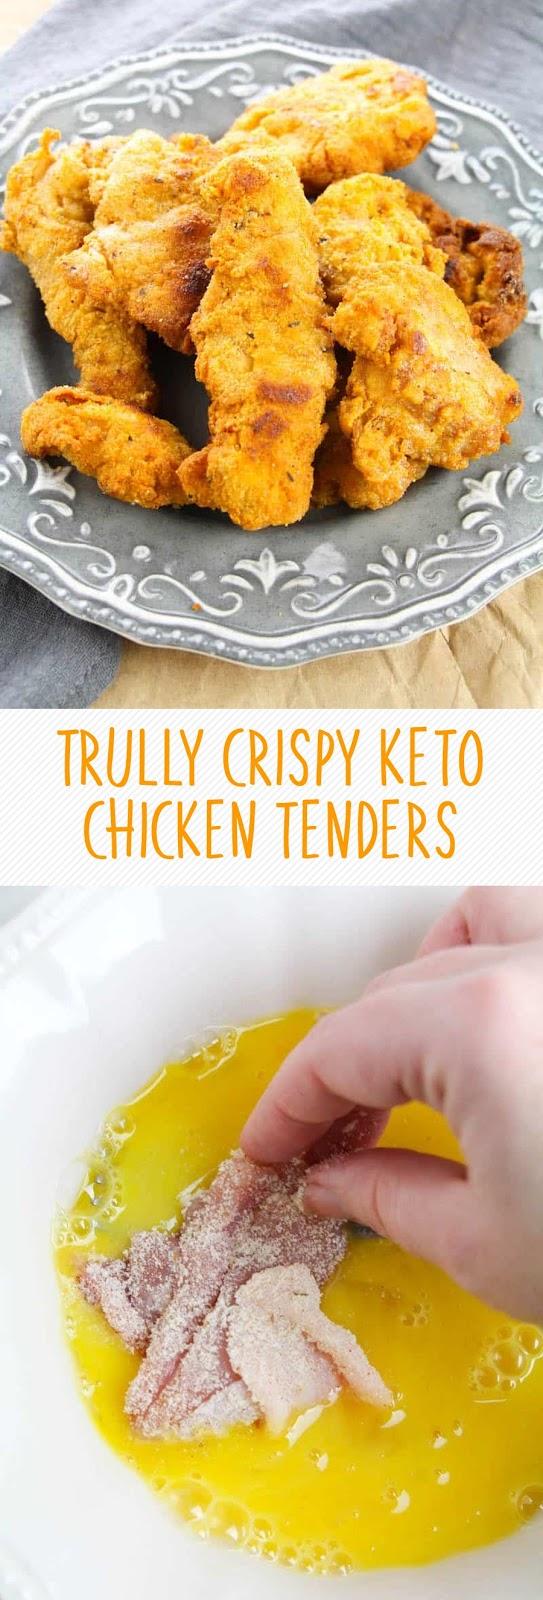 TRULLY CRISPY KETO CHICKEN TENDERS